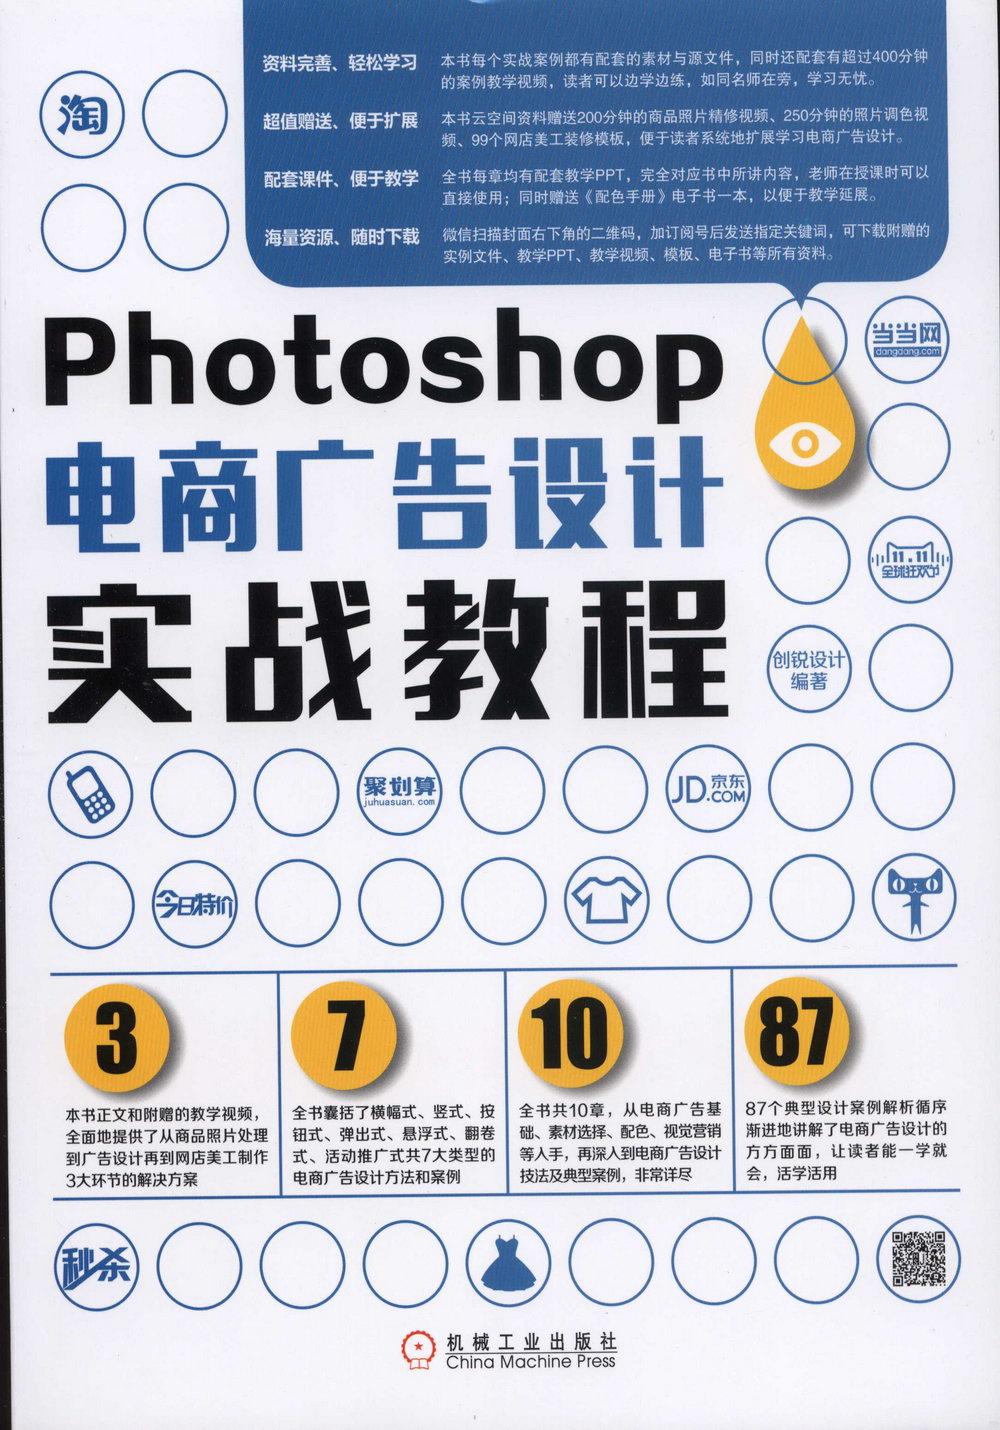 Photoshop電商廣告設計實戰教程